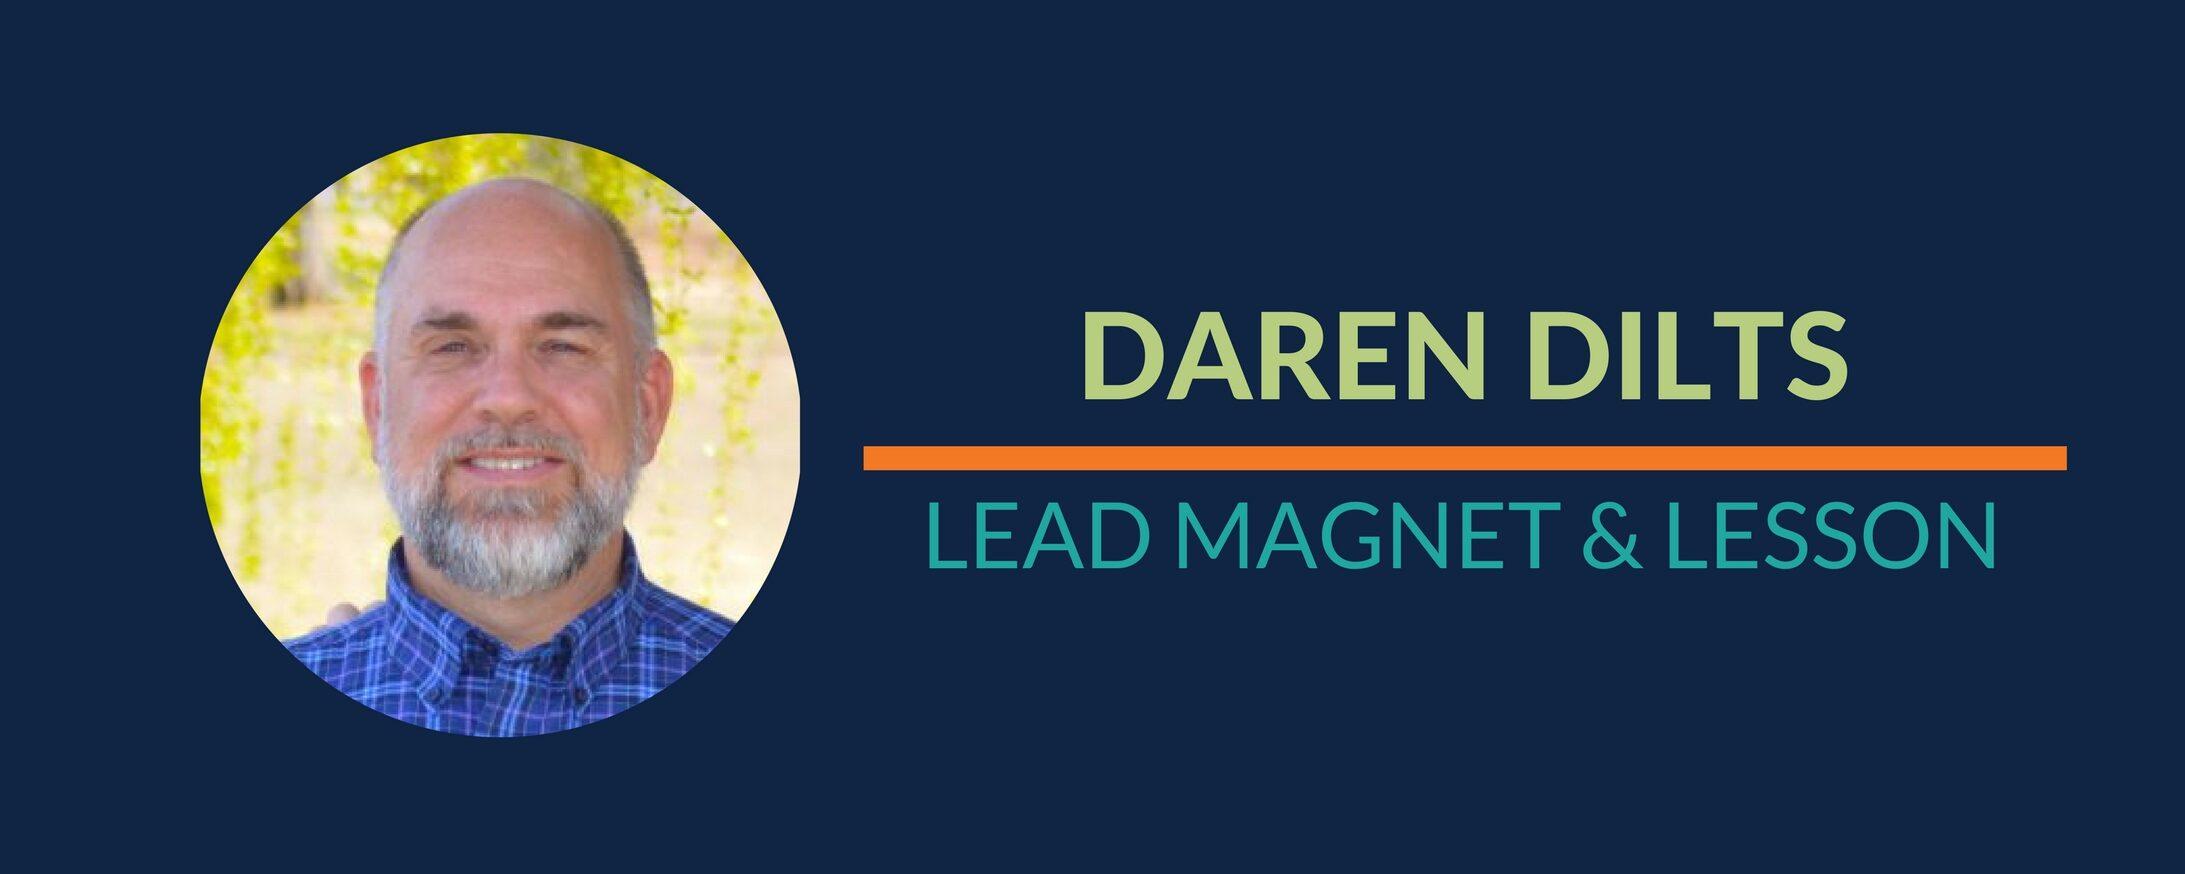 Big Steps: New Lead Magnet & Lesson